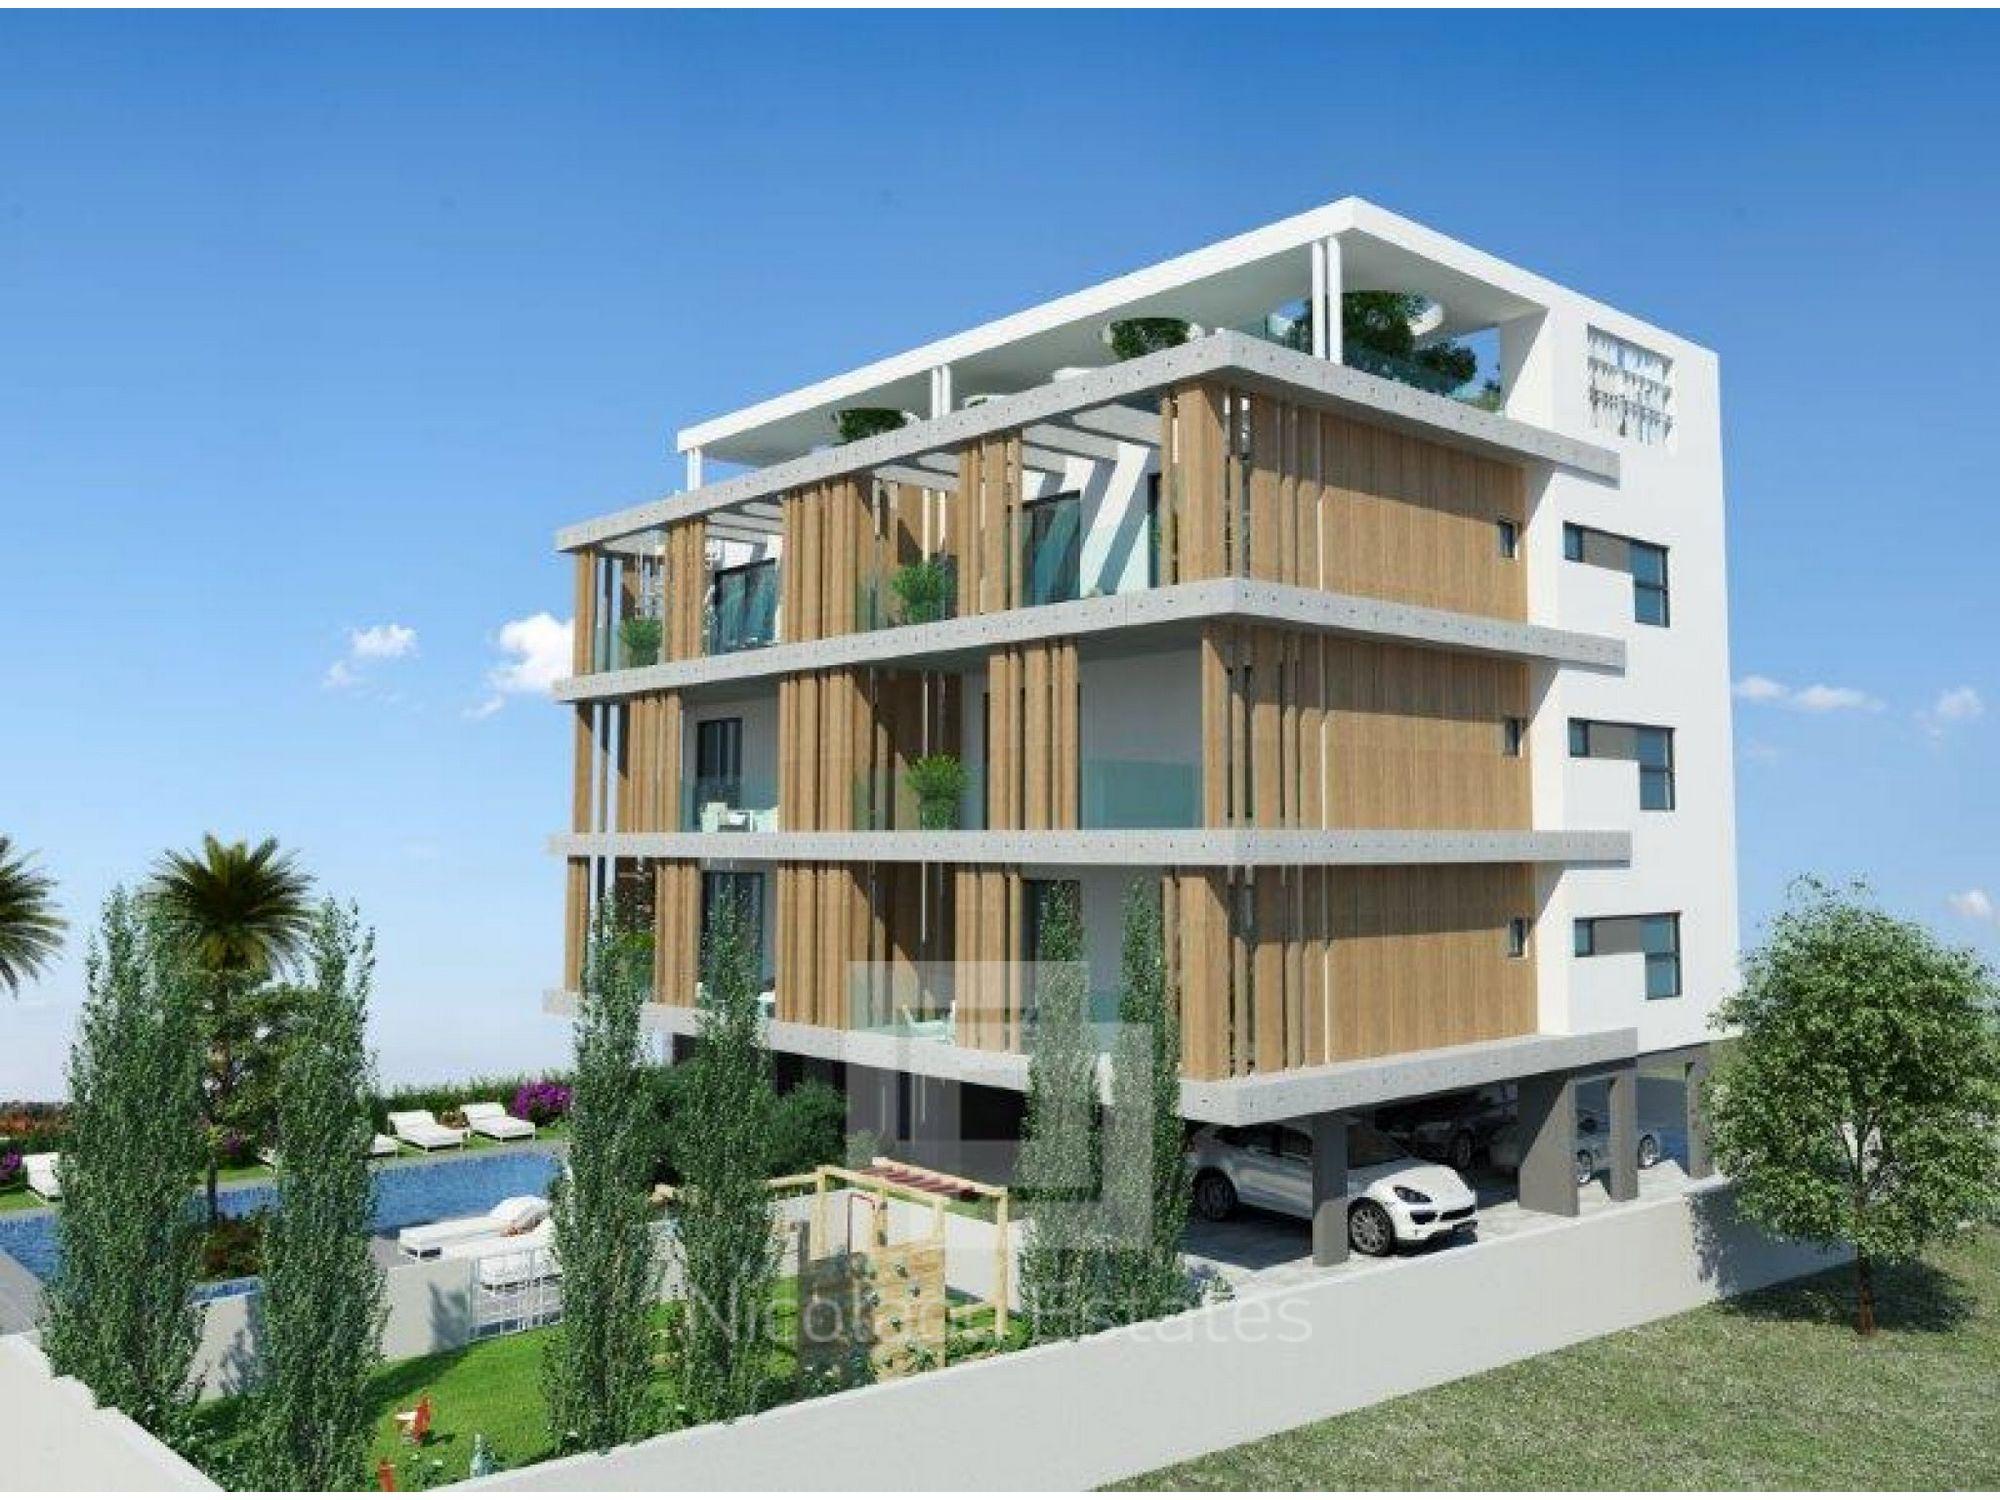 Аренда аппартаментов в лимассоле в марте2017